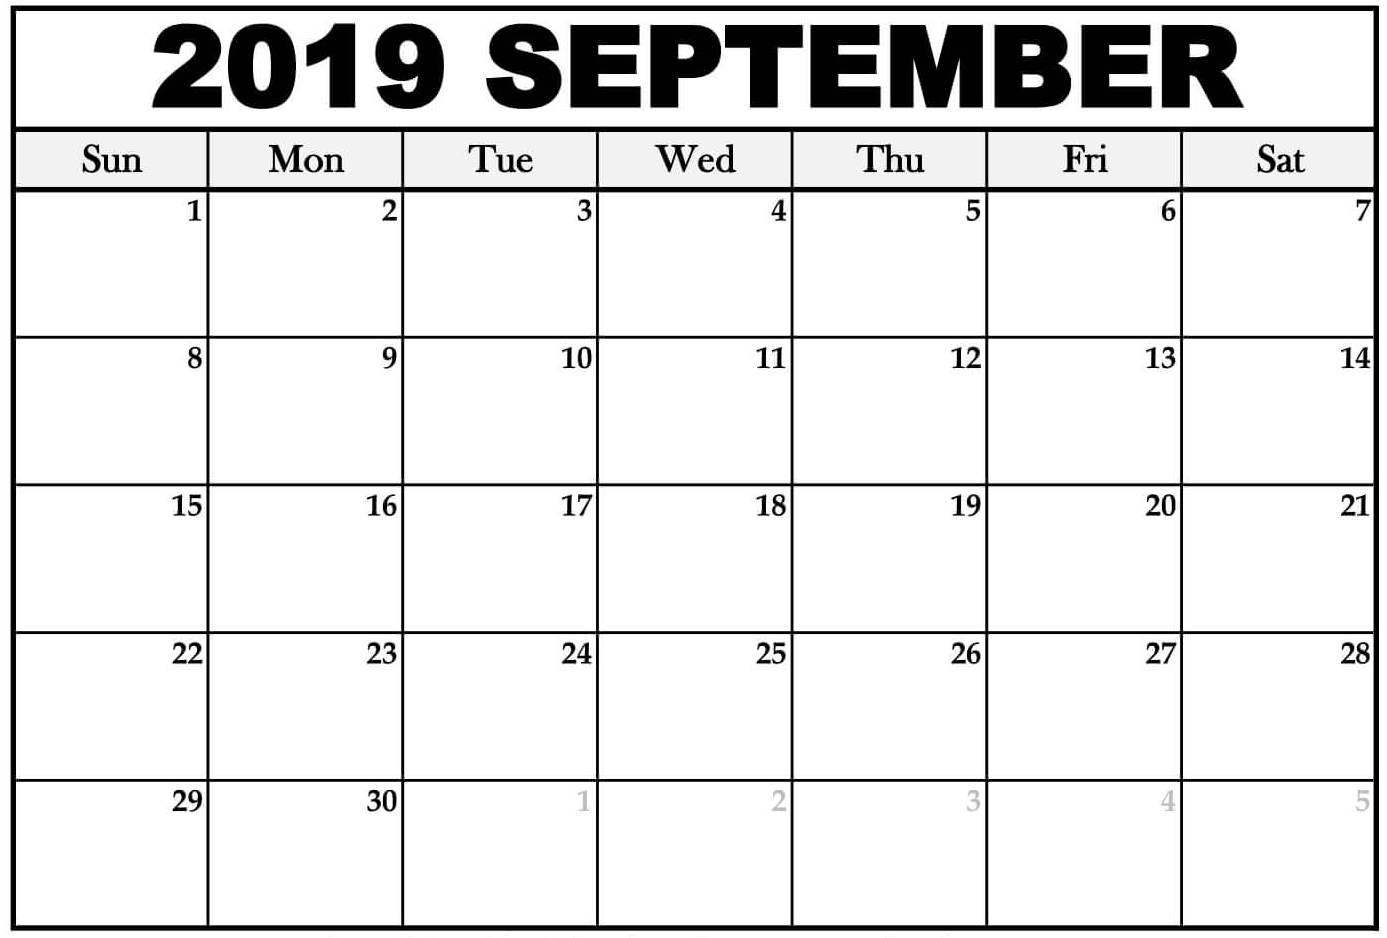 Blank Calendar September 2019   Free Printable Calendar Shop intended for Free Printable September Blank Calendars With Christian Themes